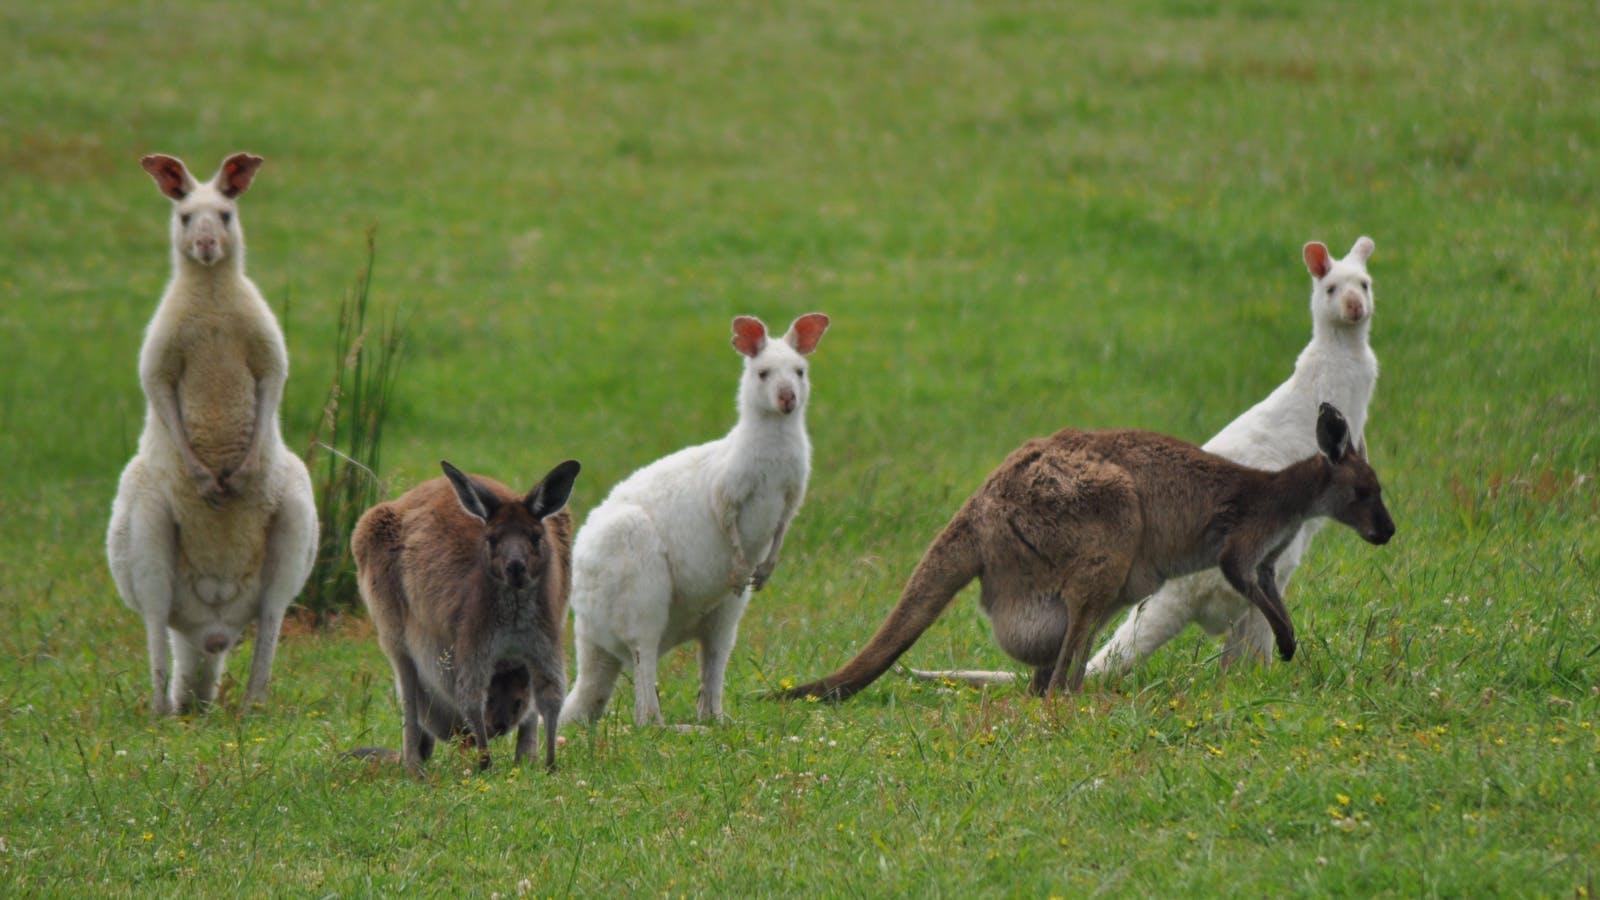 Some of our kangaroos.